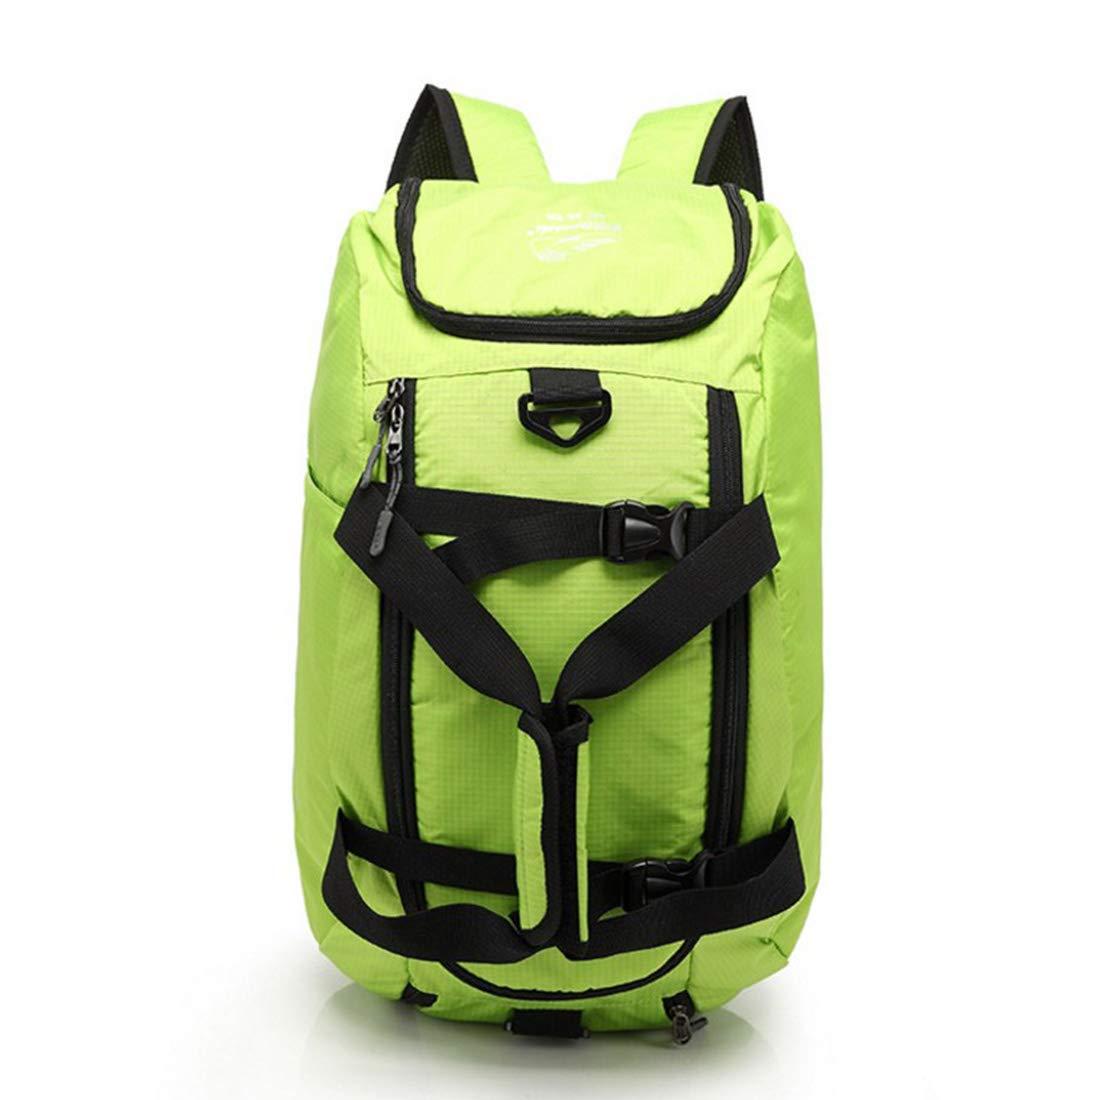 Kunliyin YY1 Multi-Funktions-Outdoor-Bergsteiger-Tasche mit hoher Kapazität (Farbe : Grün)